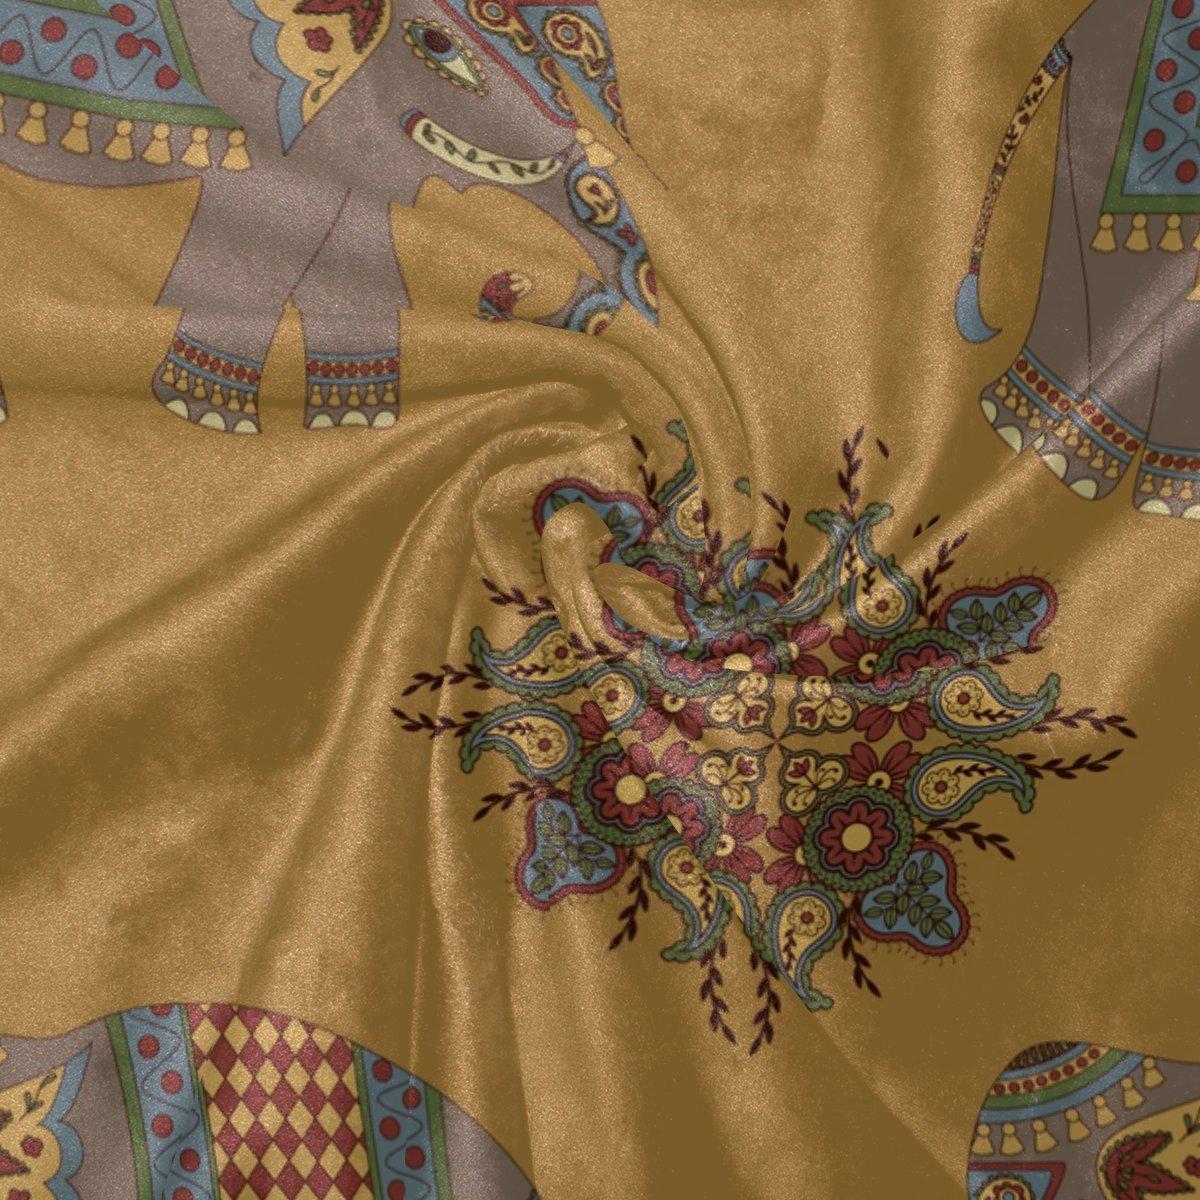 Vantaso Soft Blankets Throw India Mandala Elephants Microfiber Polyester Blankets for Bedroom Sofa Couch Living Room for Kids Children Girls Boys 60 x 90 inch by Vantaso (Image #4)